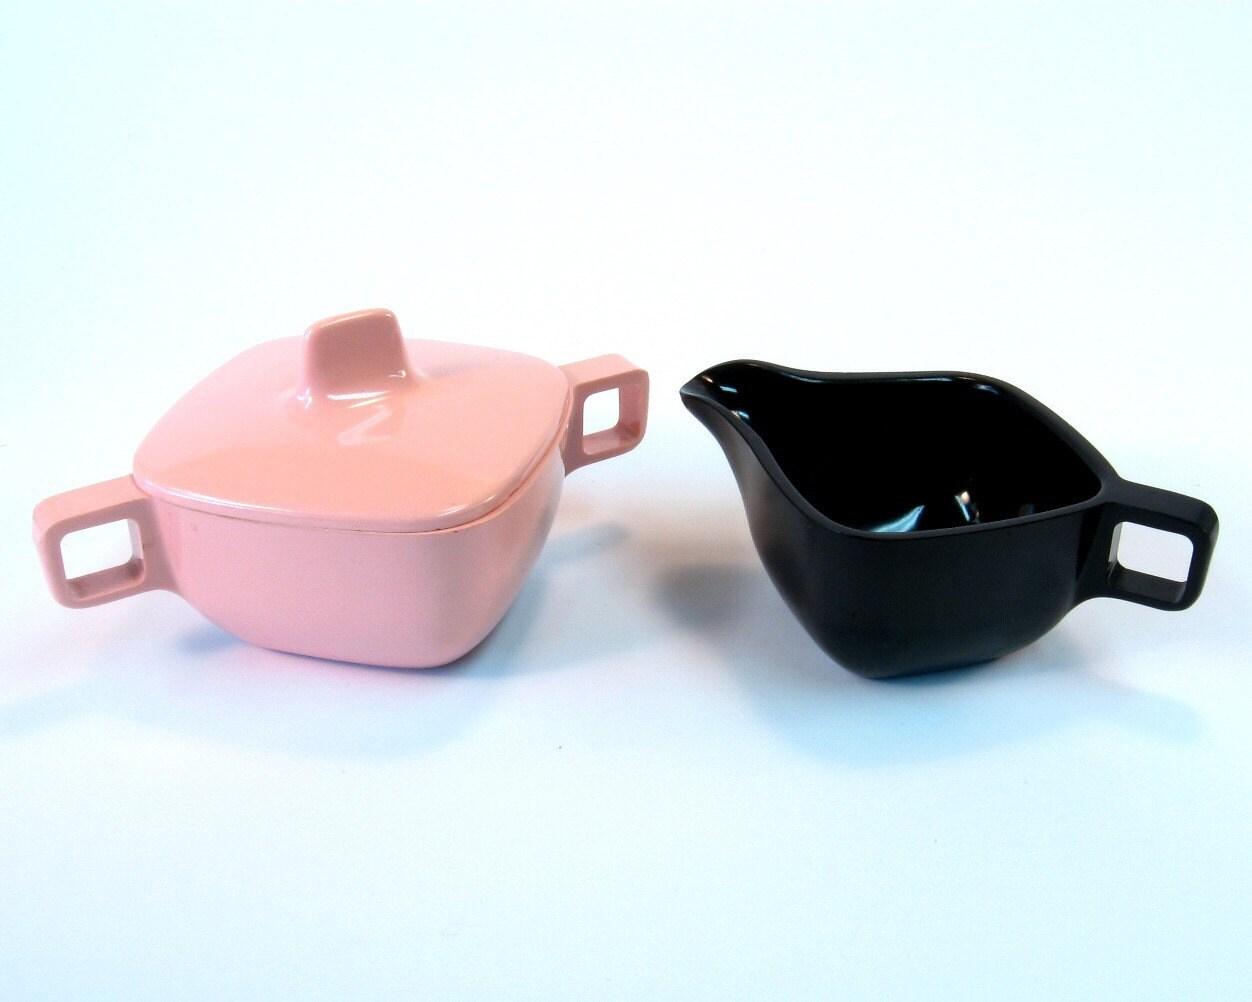 Retro Cream and Sugar Set Pink and Black Vintage Atomic Melamine